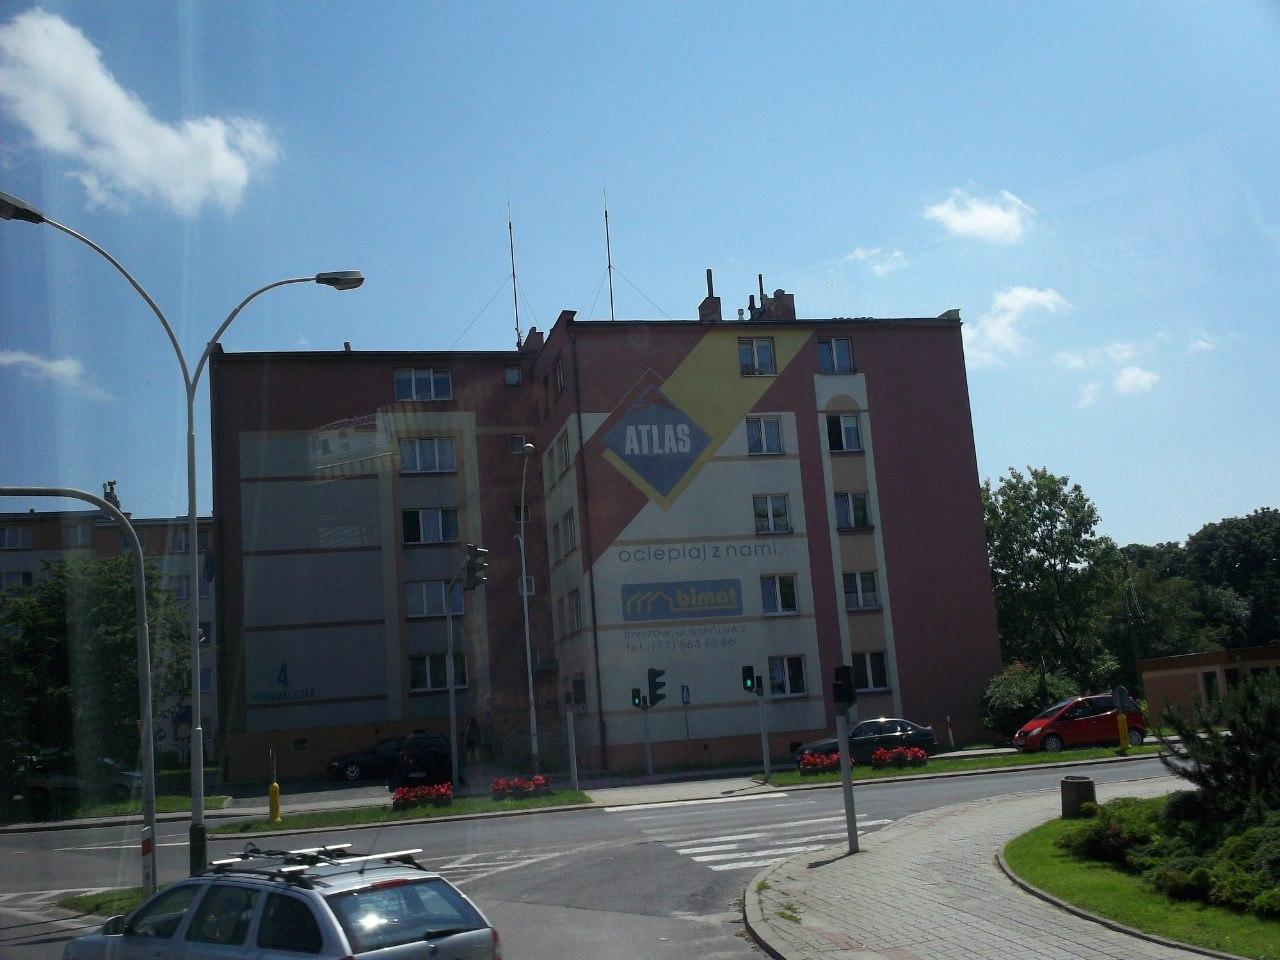 Елена Руденко. Польша. 2013 г. июнь. DVVV34iSZSk